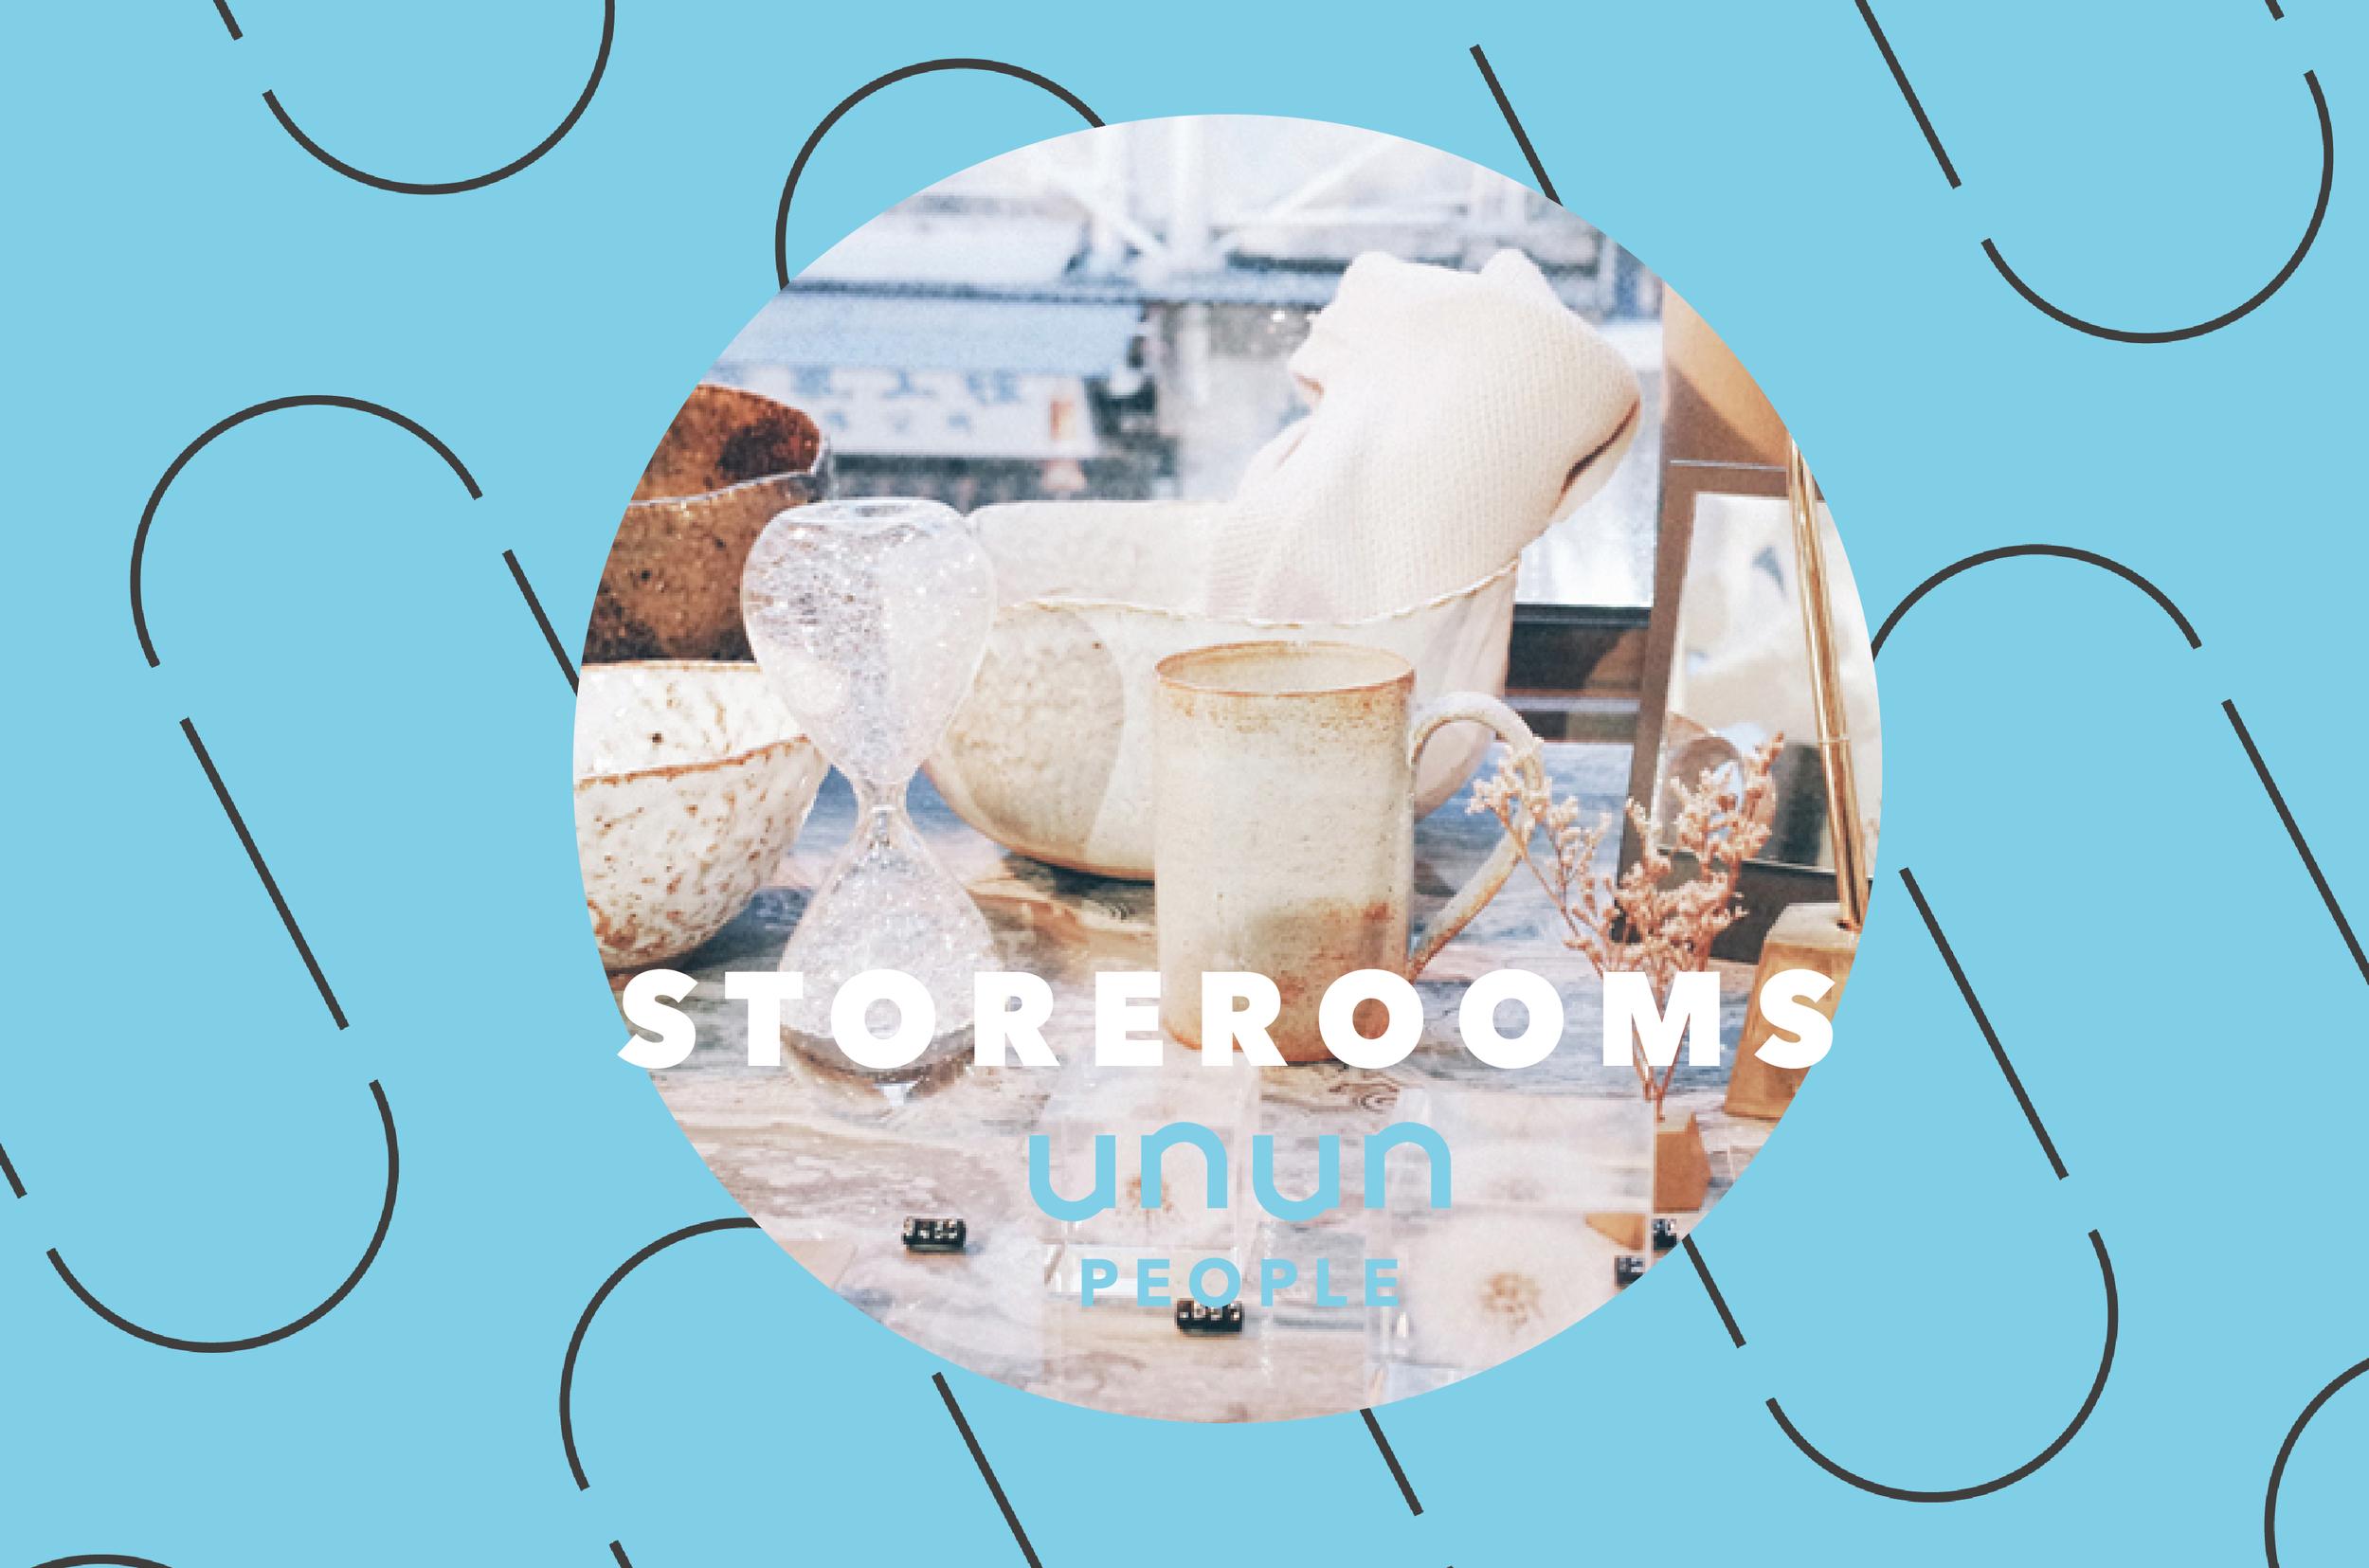 Storerooms  Select Shop